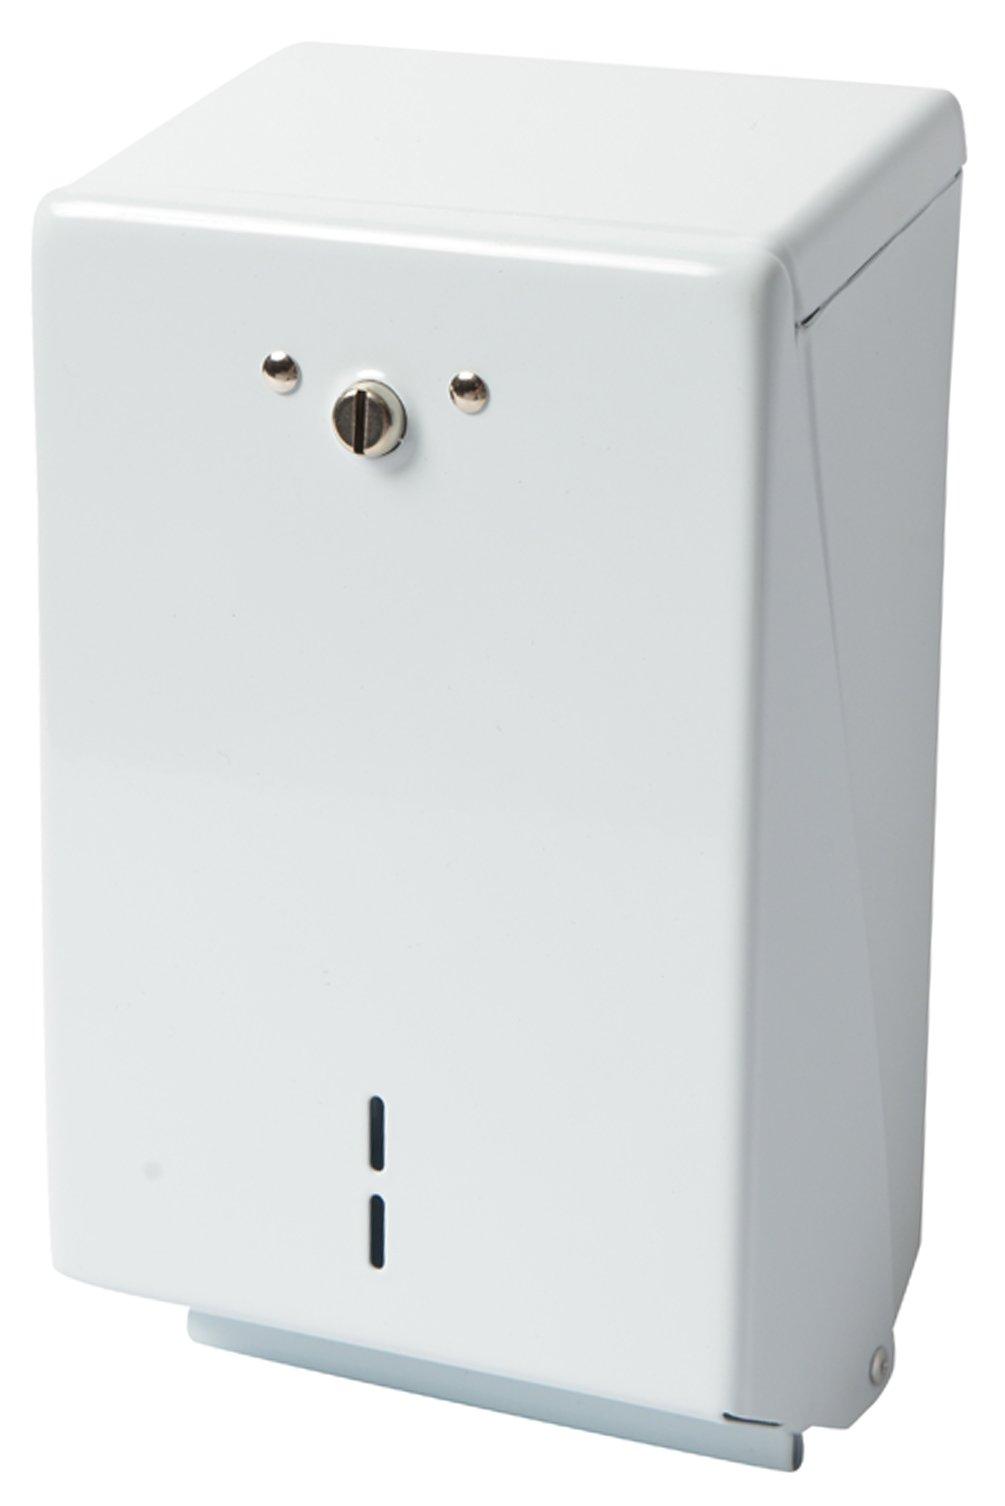 Janico 2503 Pre Cut Toilet Paper Dispenser, Dispenses Single or Double Fold Toilet Tissue, Capacity 1330 Tissues, White, 1 Pc